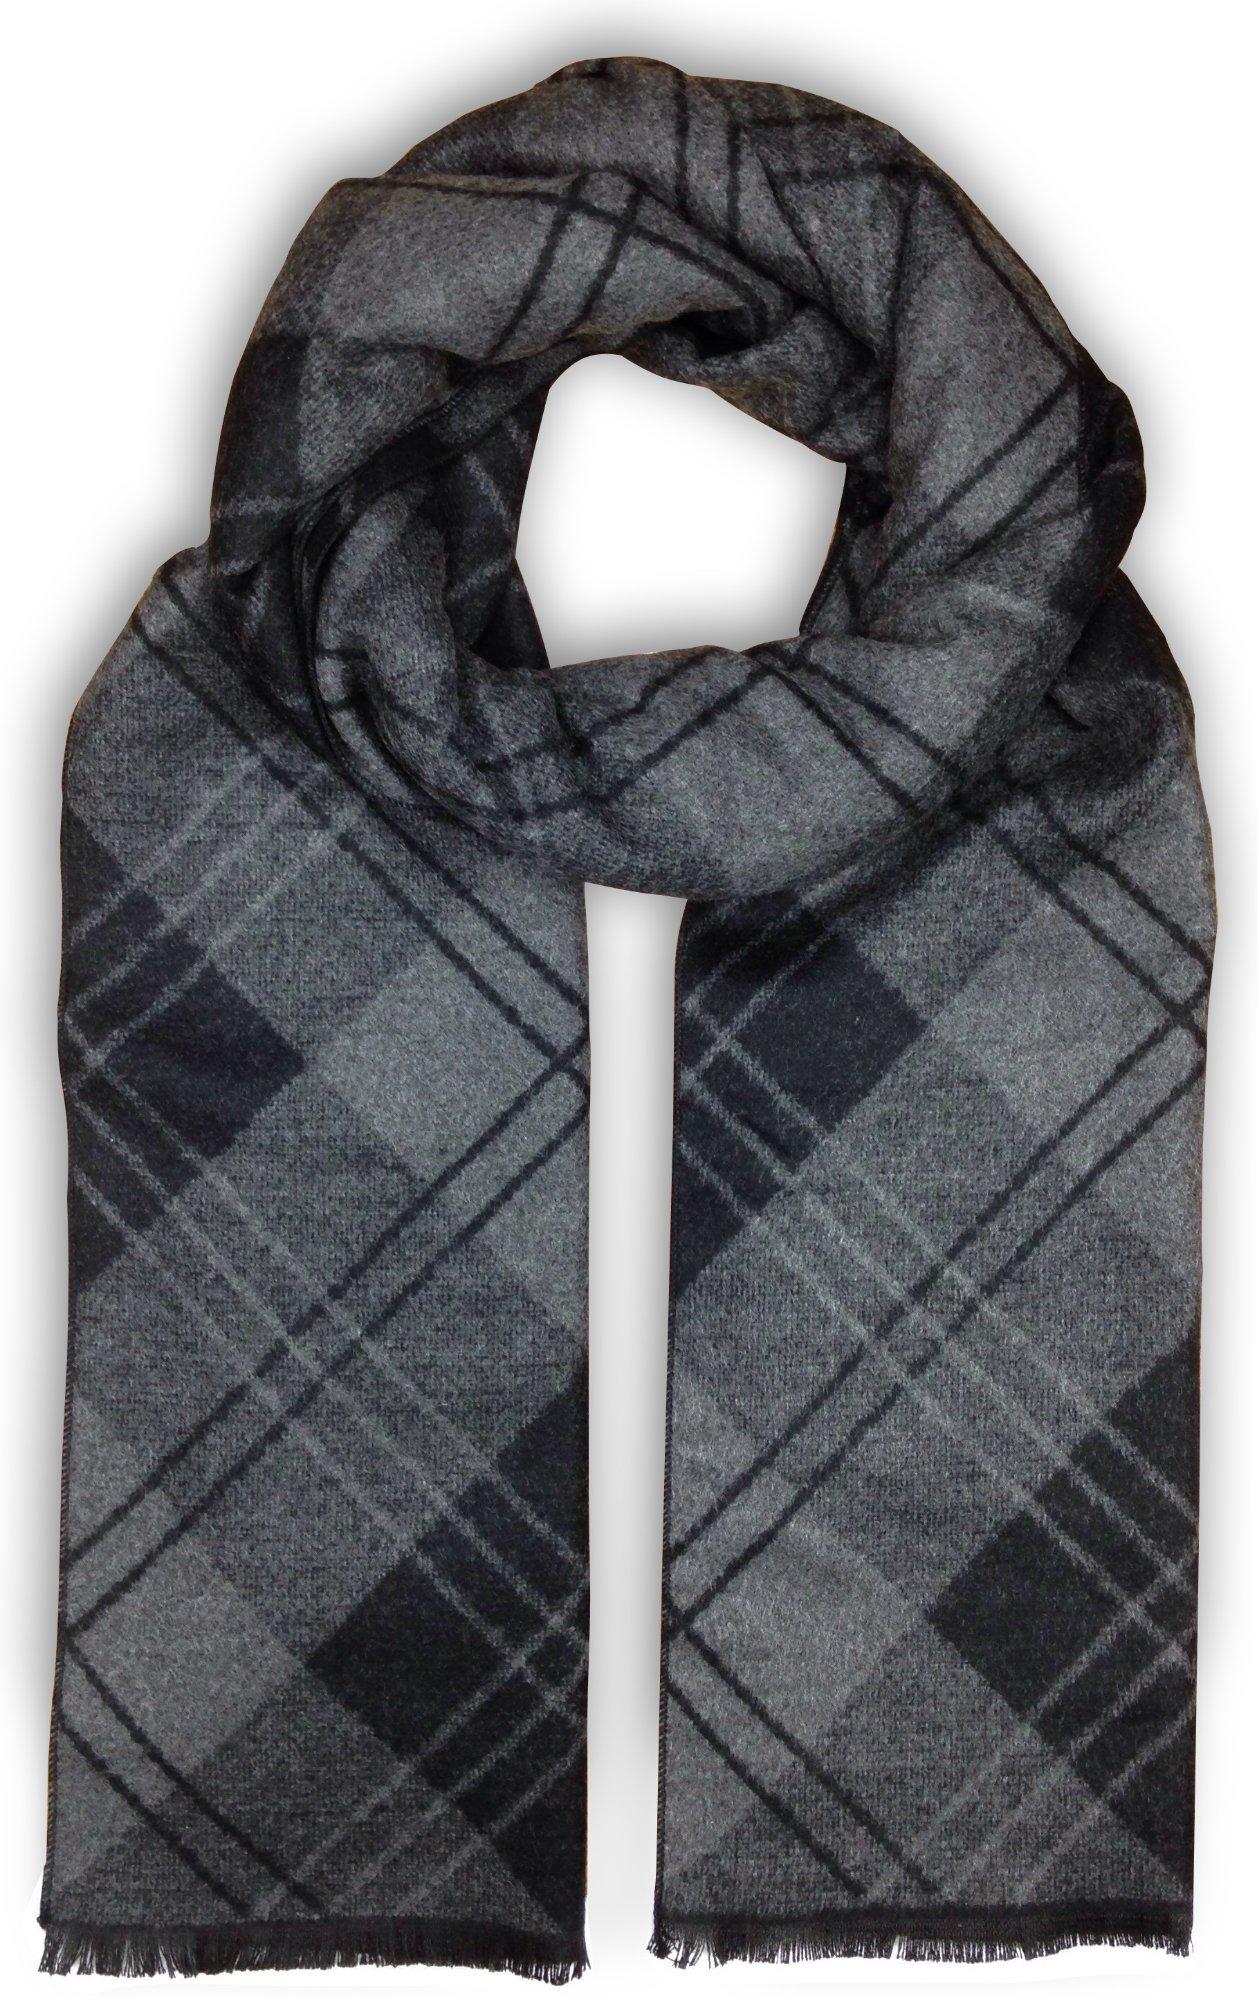 Bleu Nero Luxurious Winter Scarf for Men and Women – Large Selection of Unique Design Scarves – Super Soft Premium Cashmere Feel Black Grey Diagonal Plaid